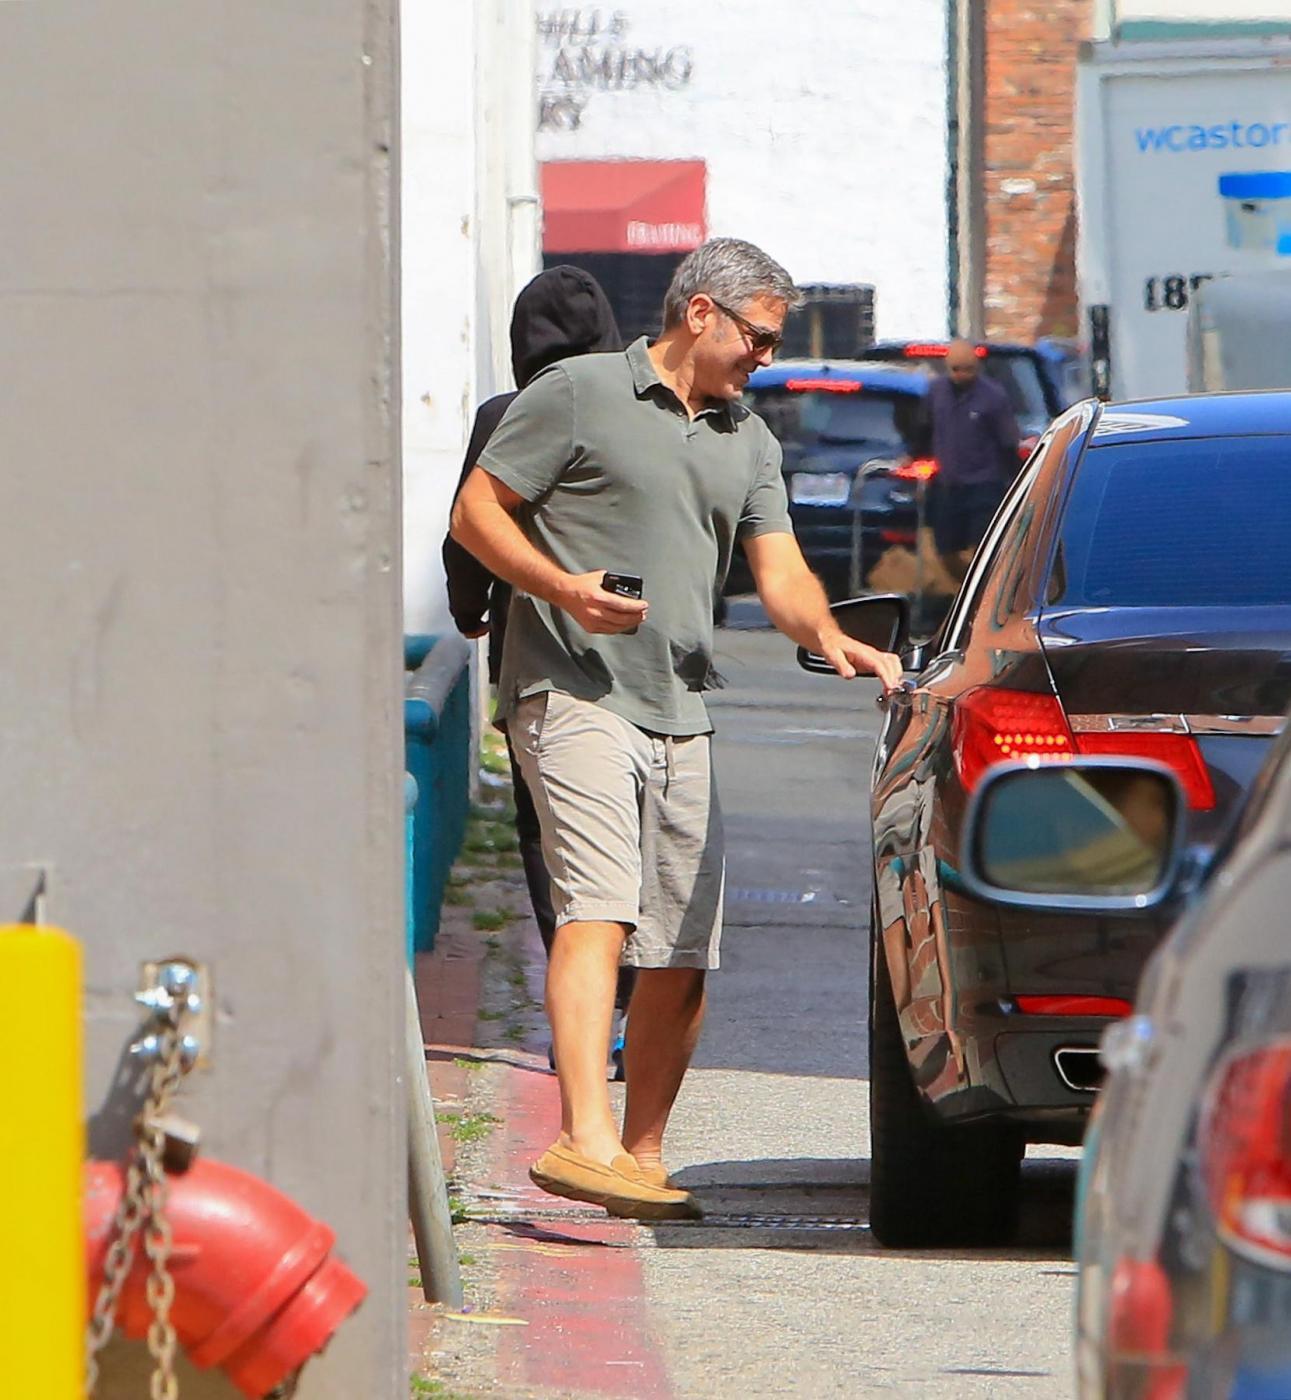 George Clooney, pantaloni corti e mocassini in giro per Beverly Hills FOTO 13